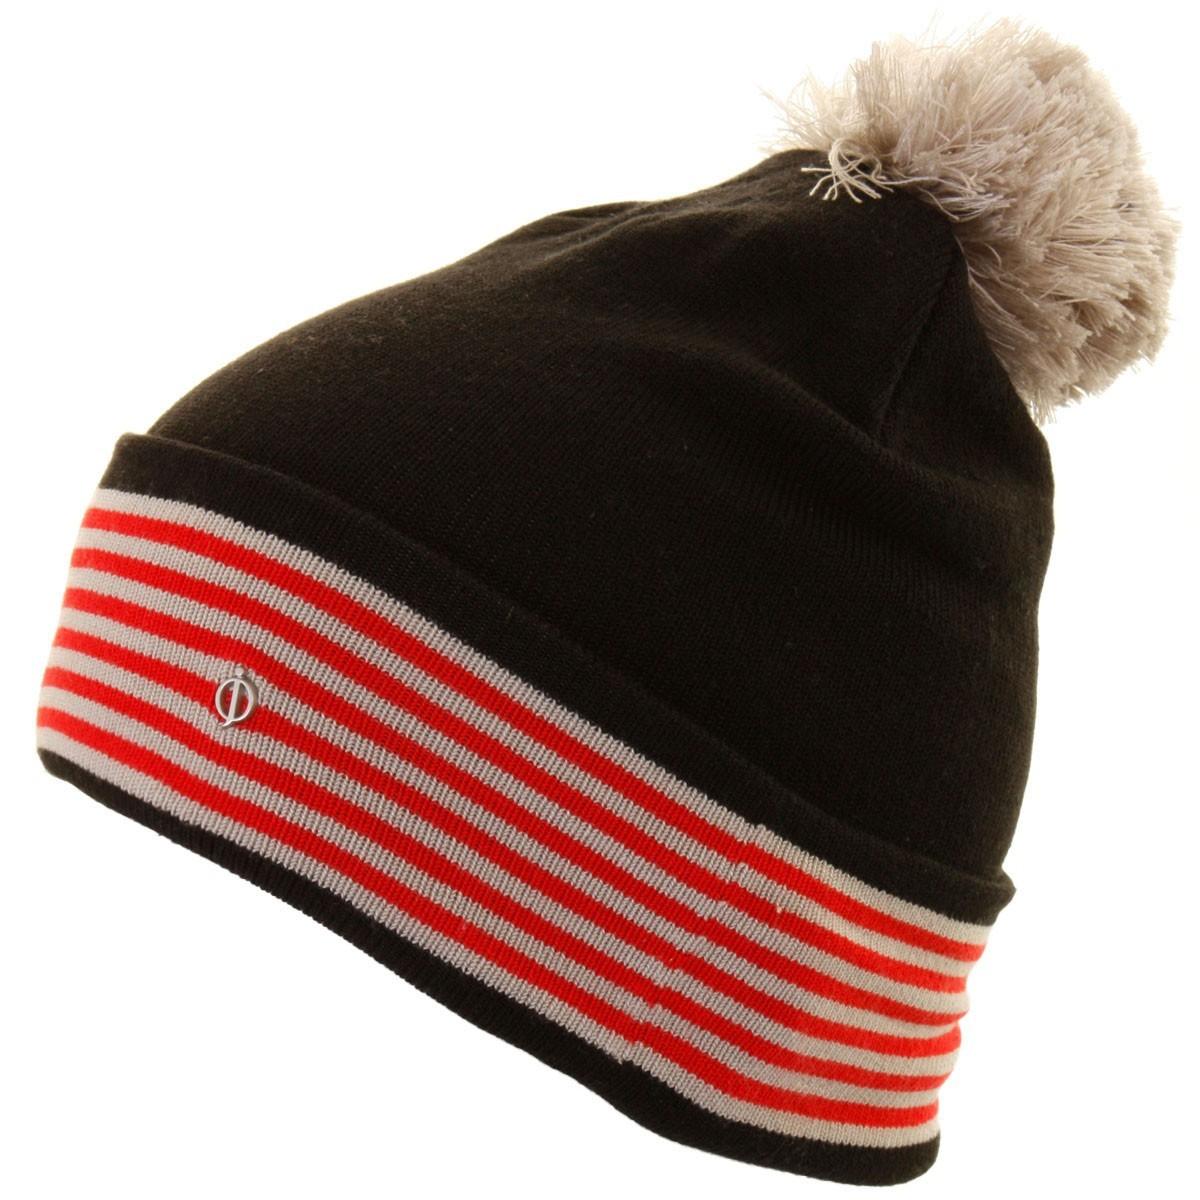 b4796c3d110 Oscar Jacobson 2015 Mens Pete Golf Hat Bobble Beanie Wooly Winter Pom Pom